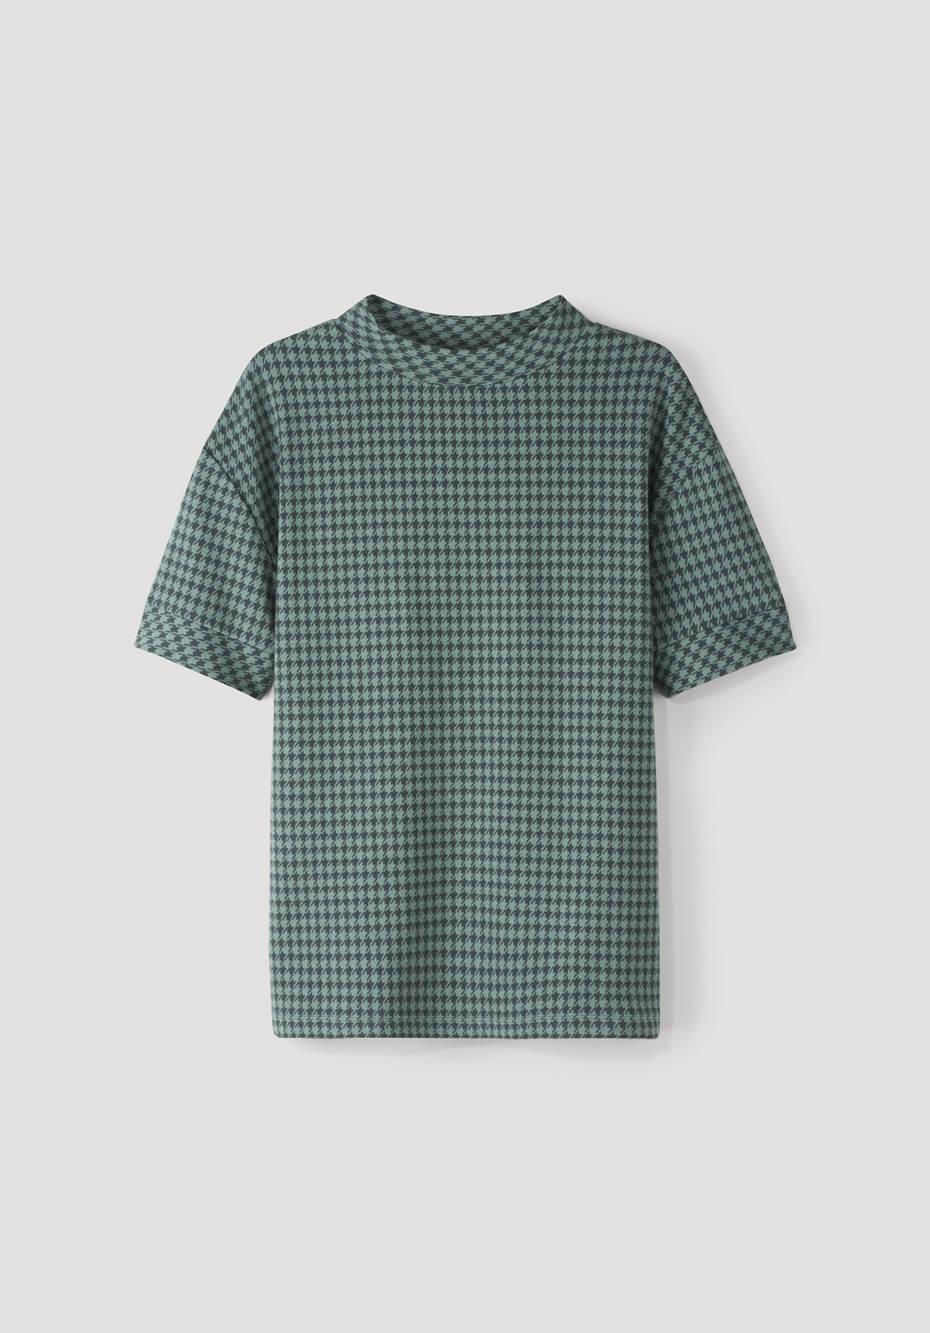 Organic cotton jacquard shirt